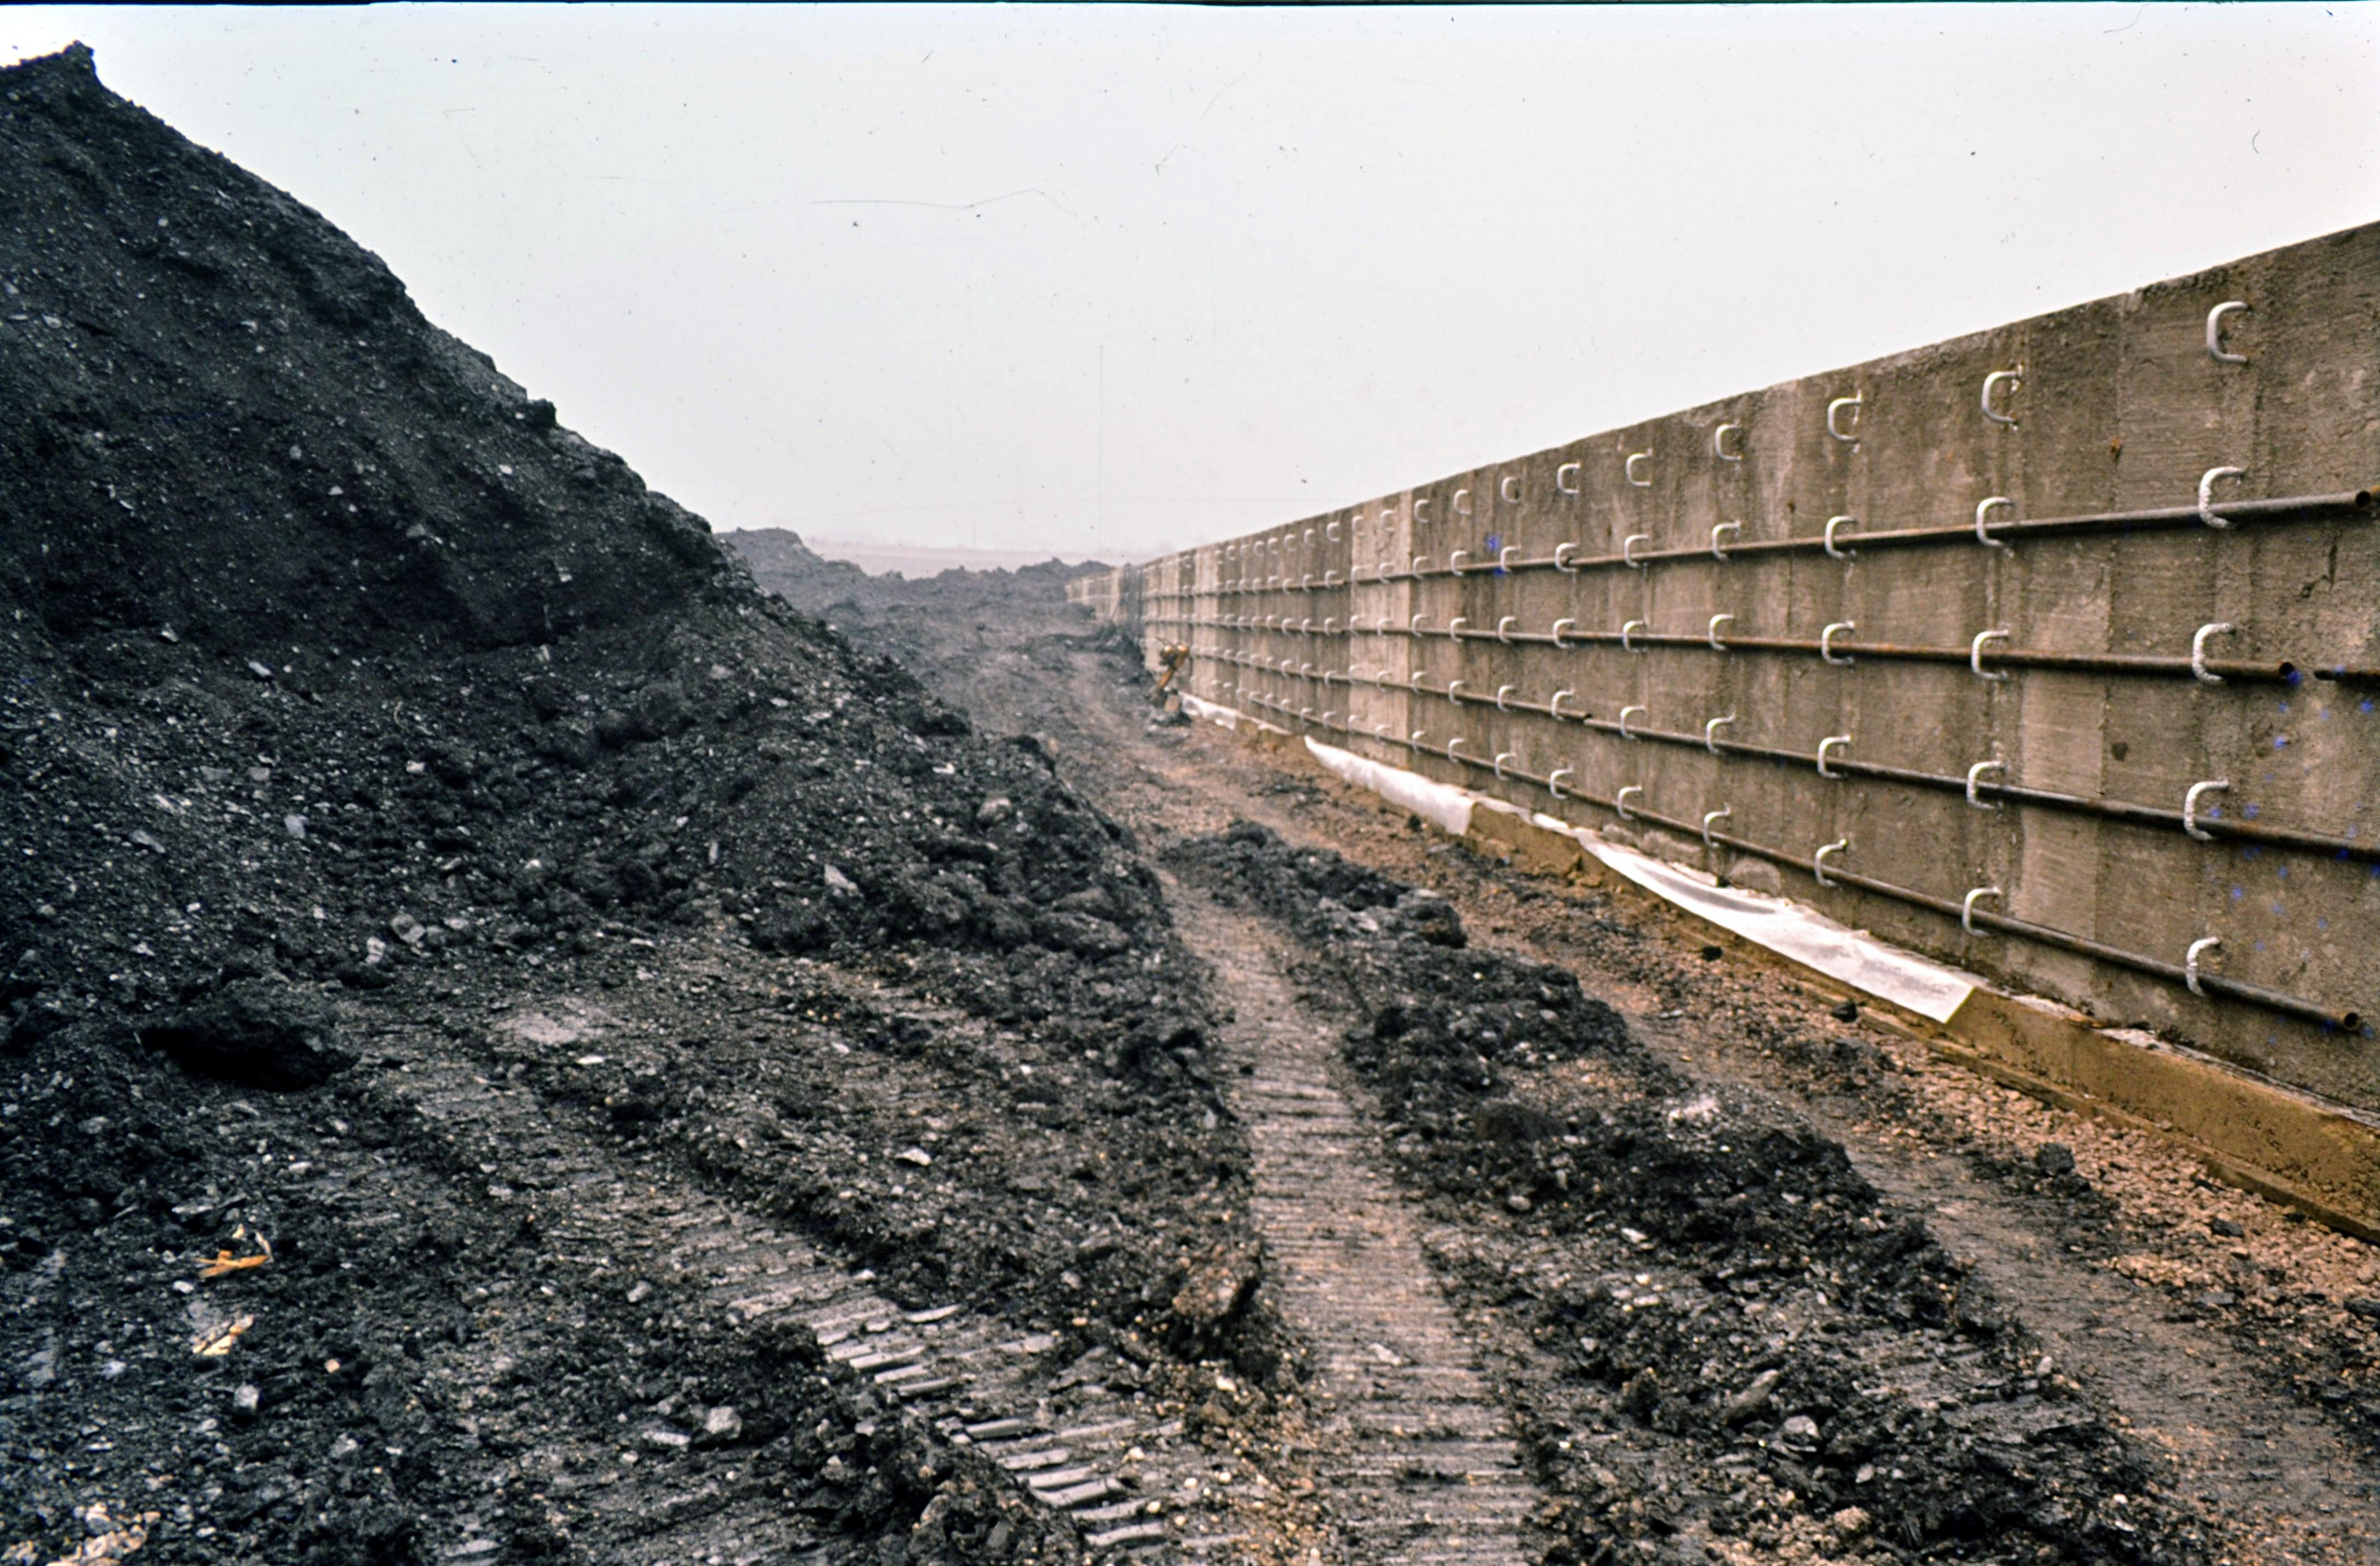 Silkstone colliery